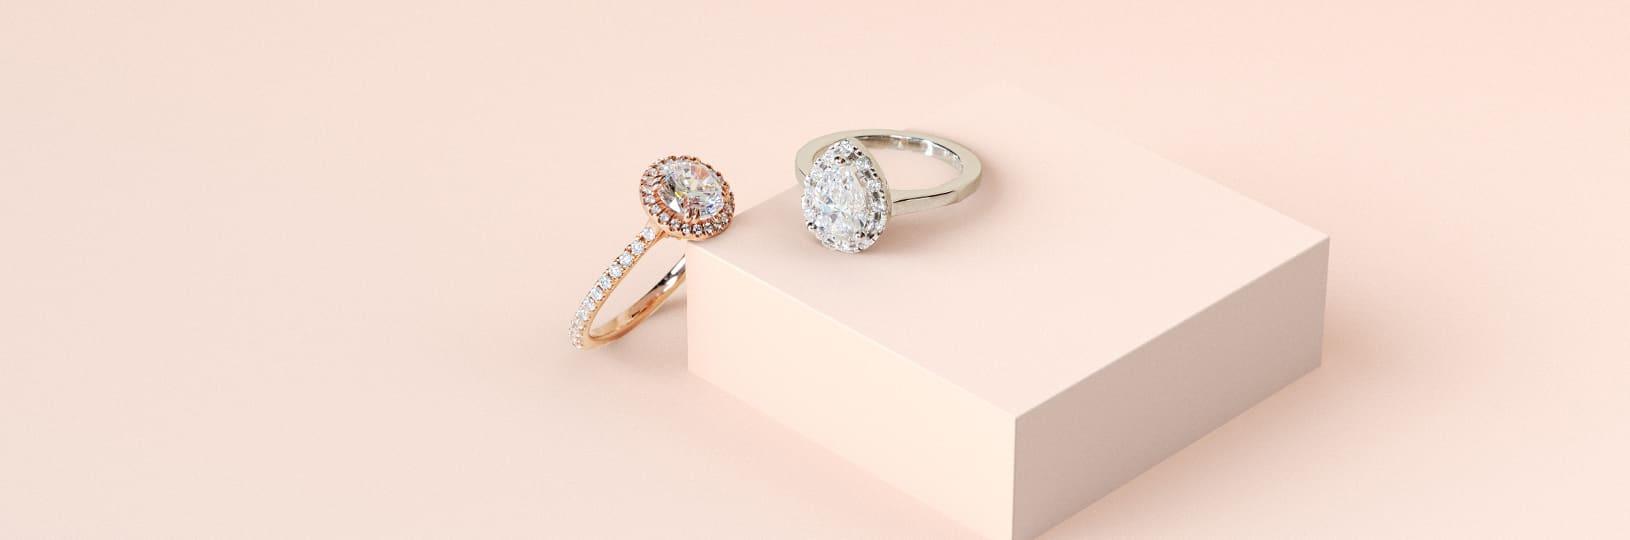 Lab diamond carat weights